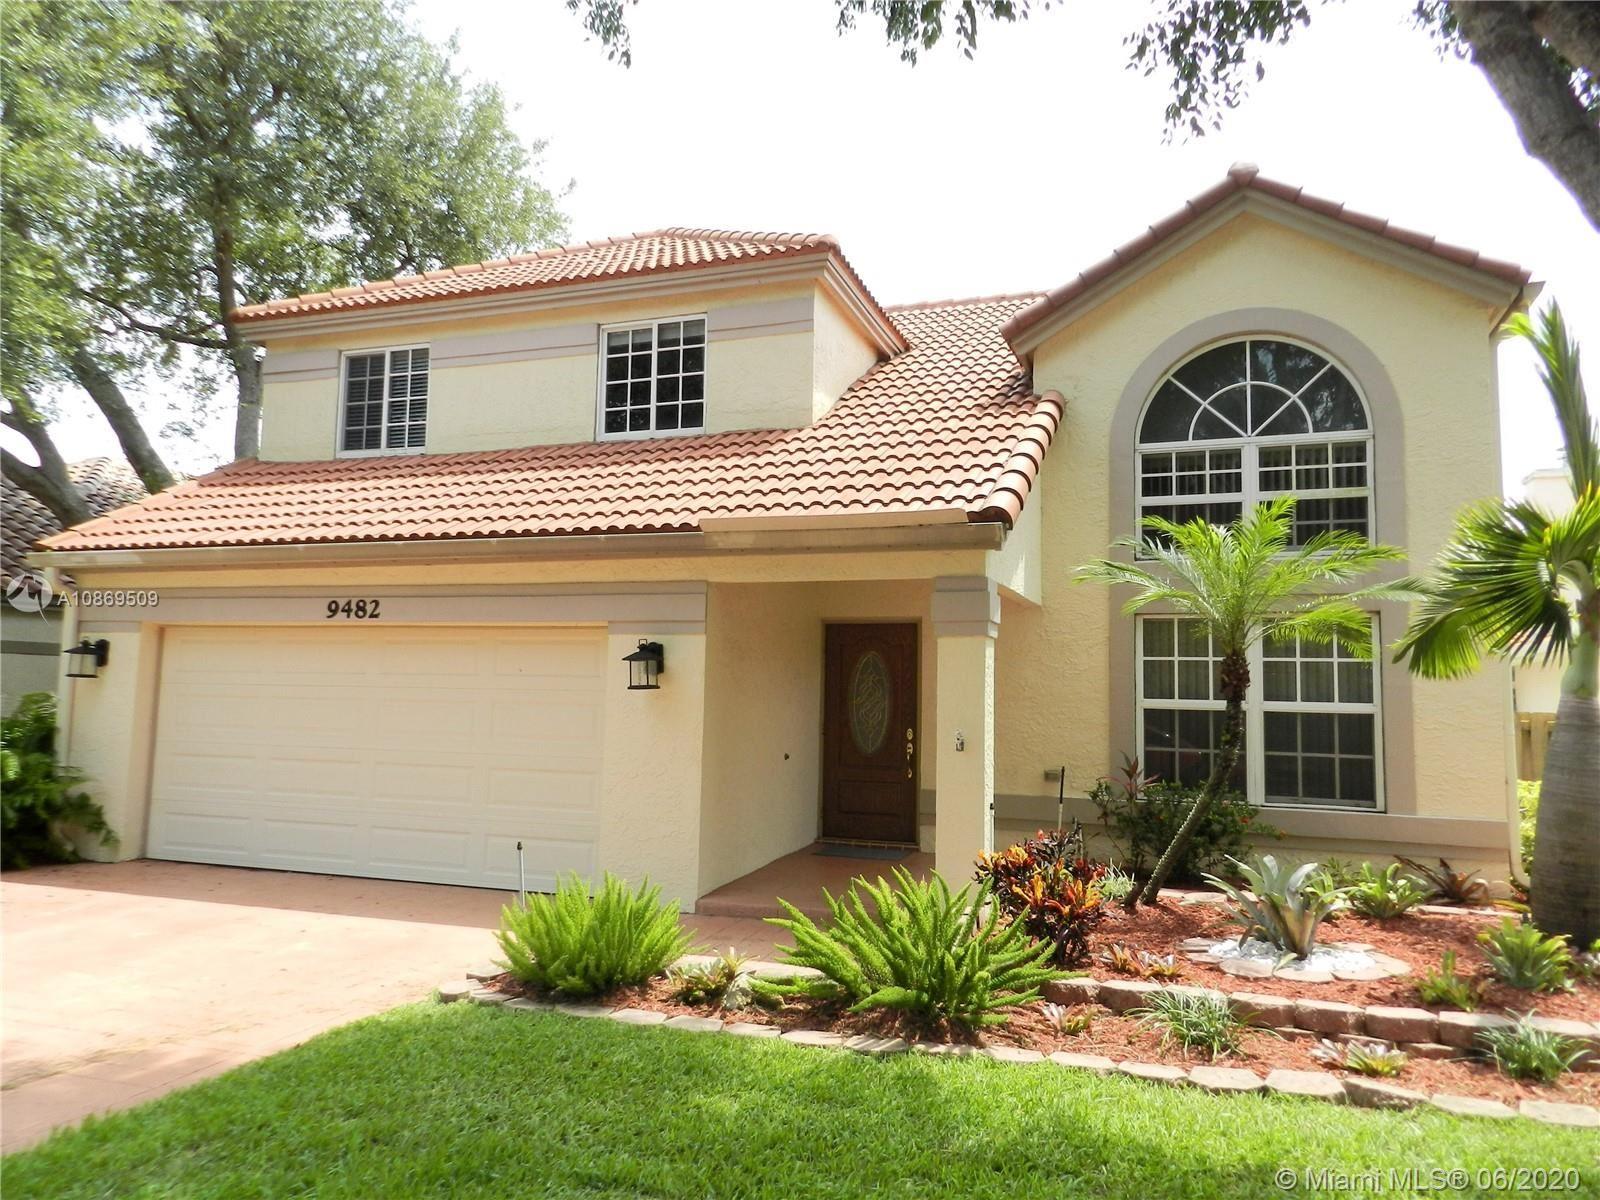 Photo of 9482 Oak Grove Cir, Davie, FL 33328 (MLS # A10869509)